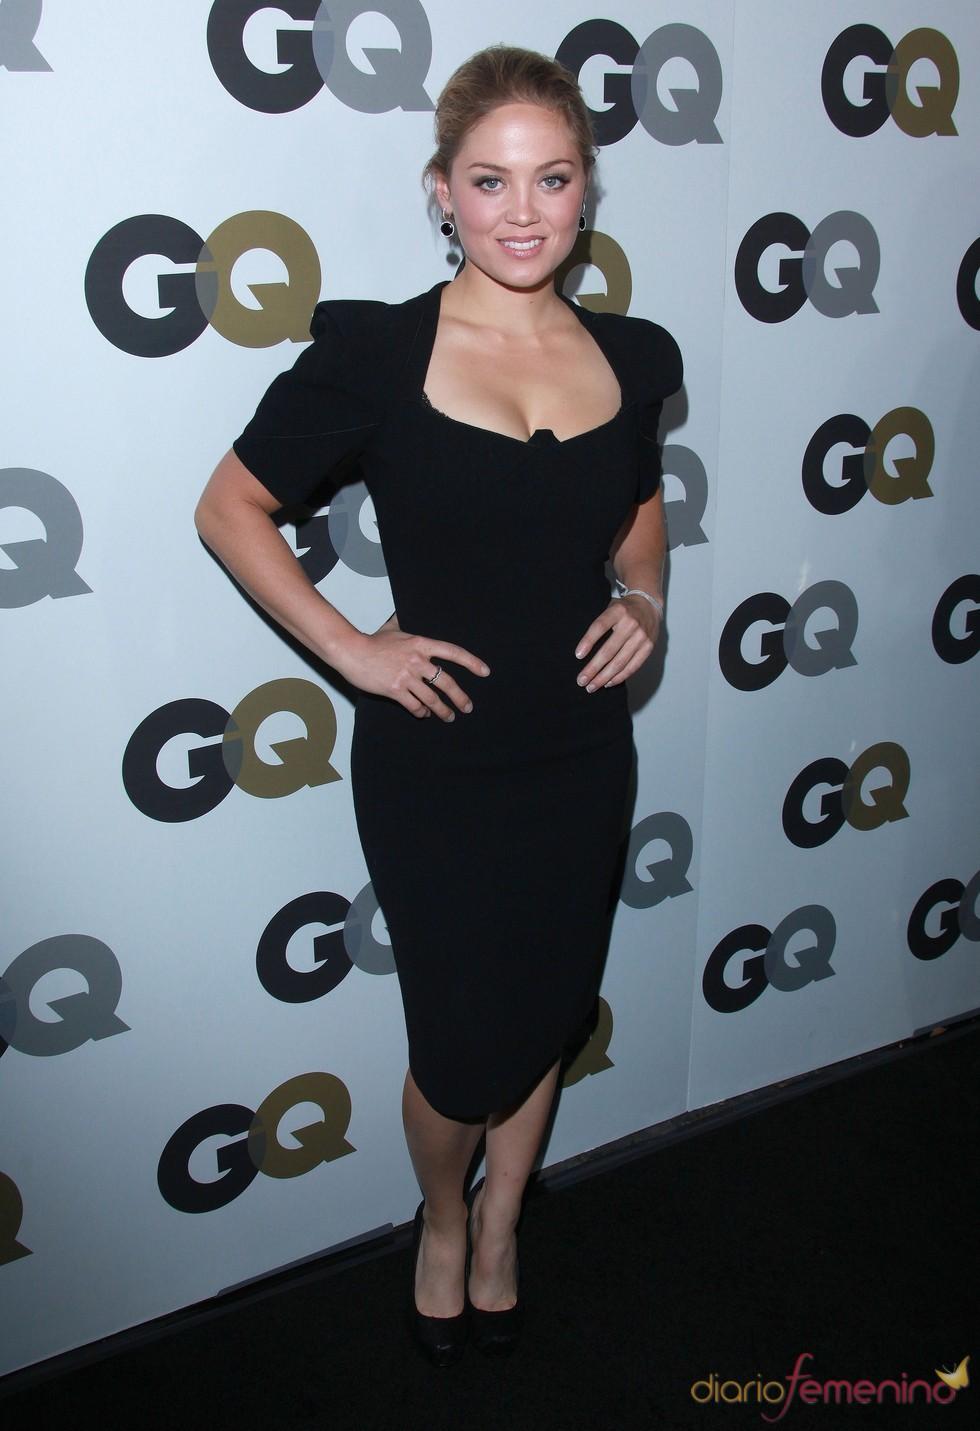 Erika Christensen en la Fiesta GQ 2010